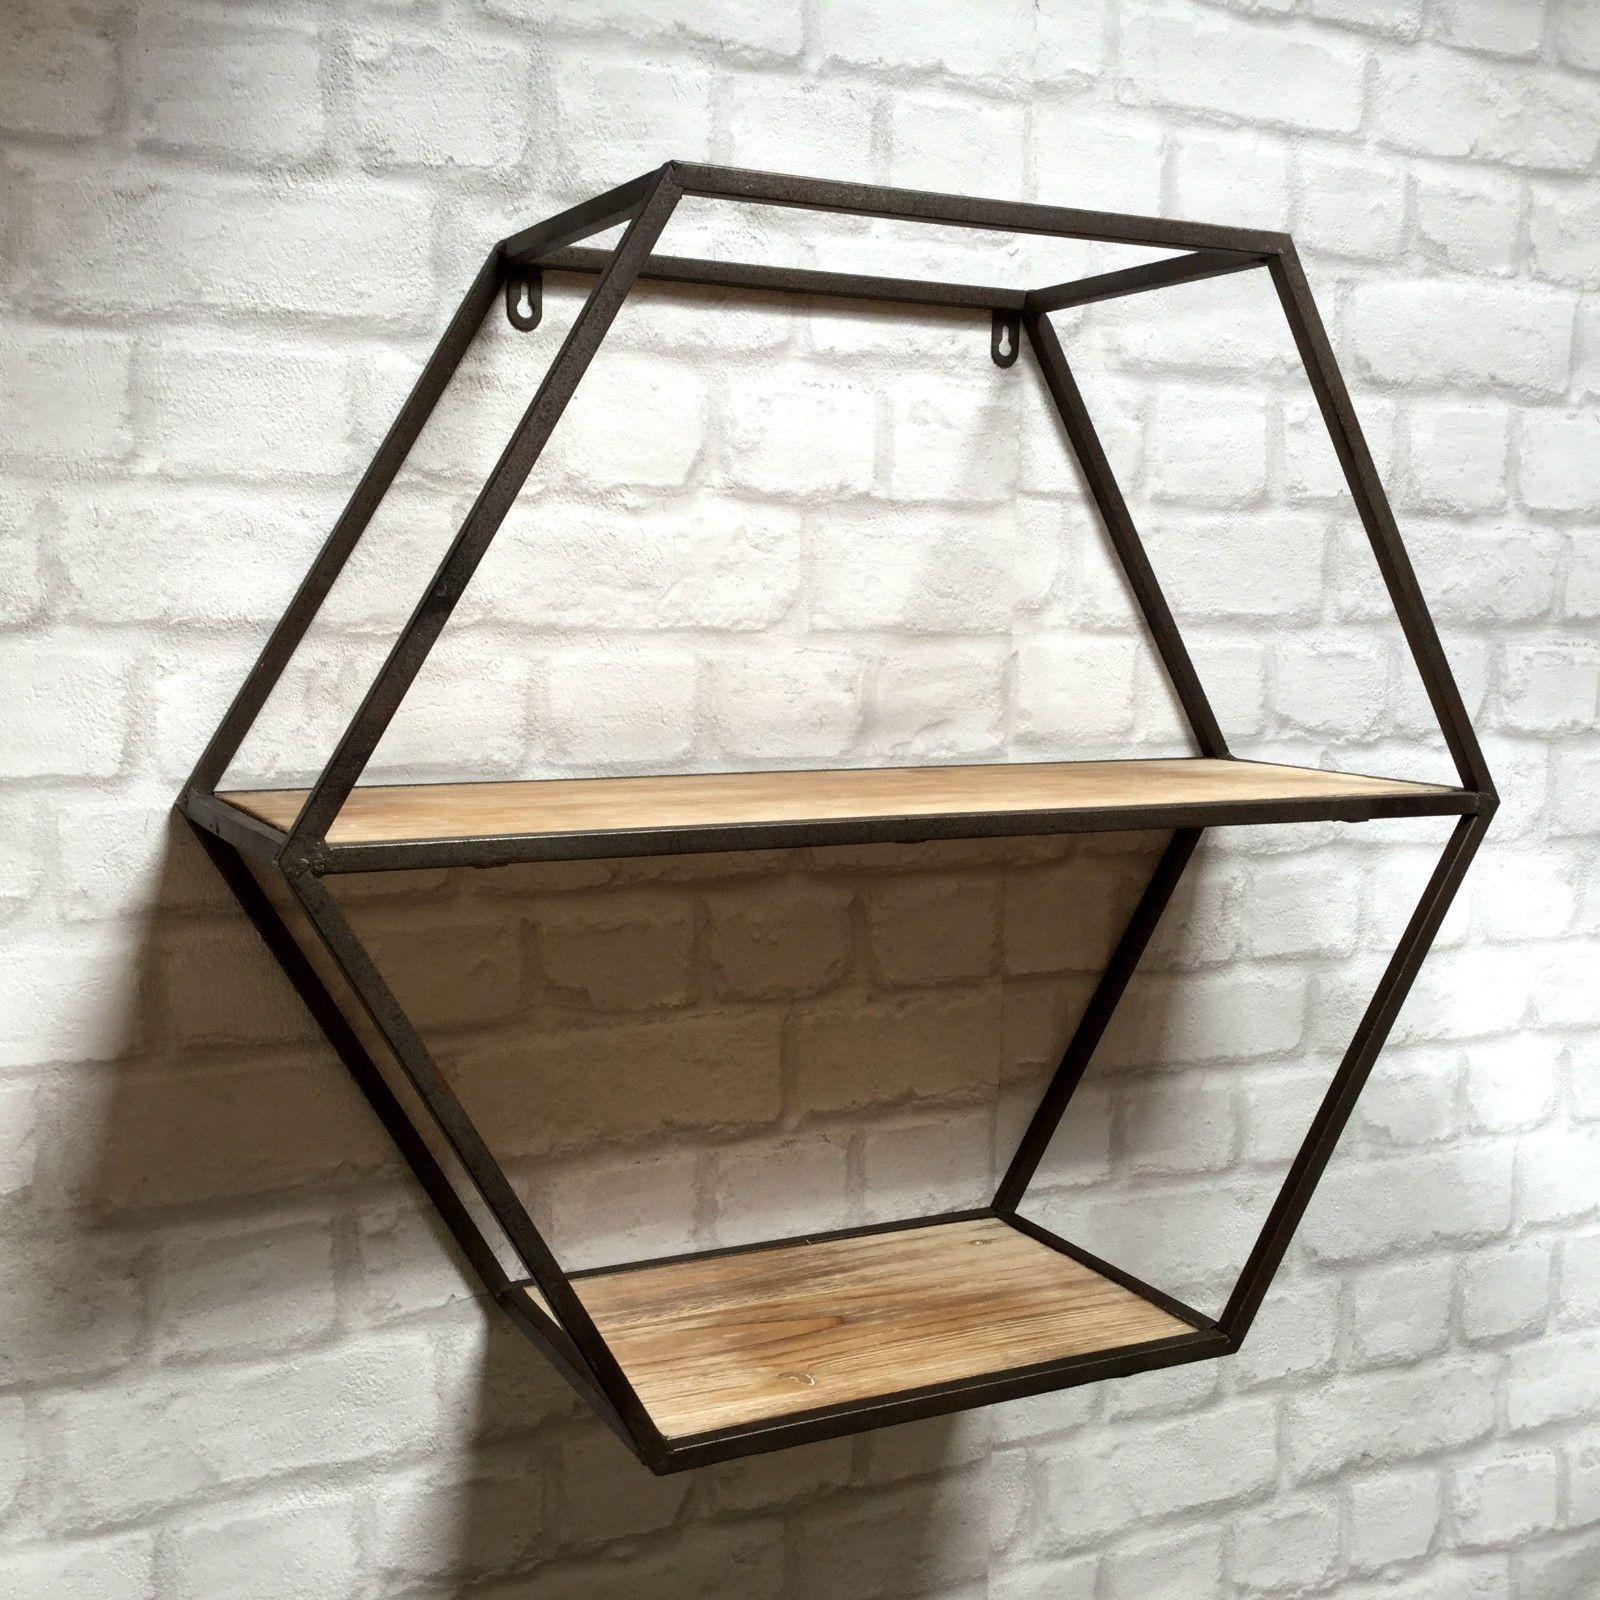 Industrial Metal Kitchen Shelves: Vintage Industrial Style Metal Wall Shelf Unit Storage